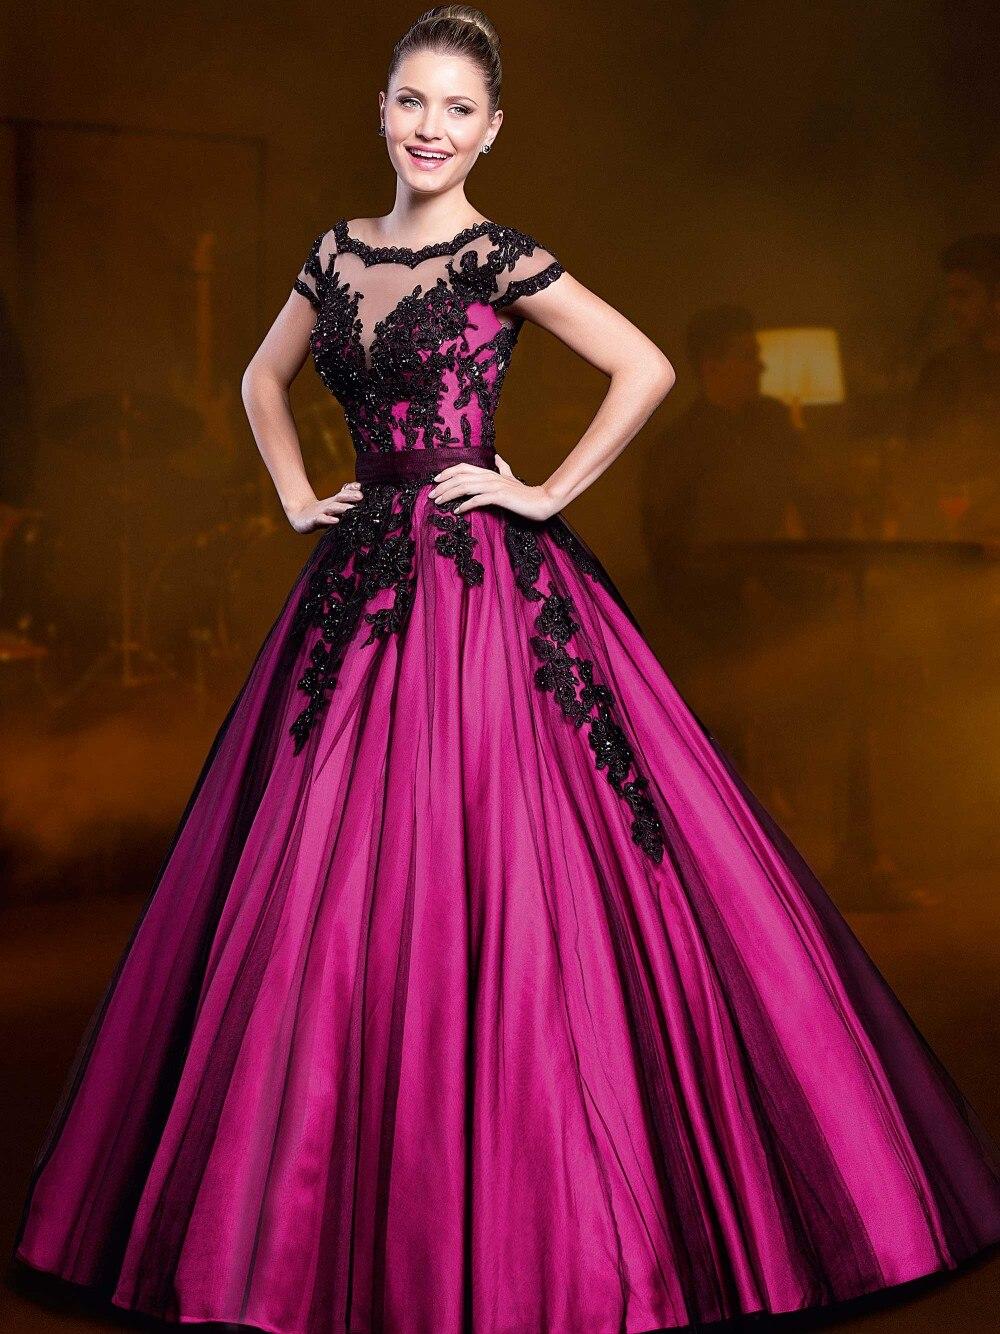 Baile jupon mariage 2018 Encaje appliqued dos tonos sexy partido ...